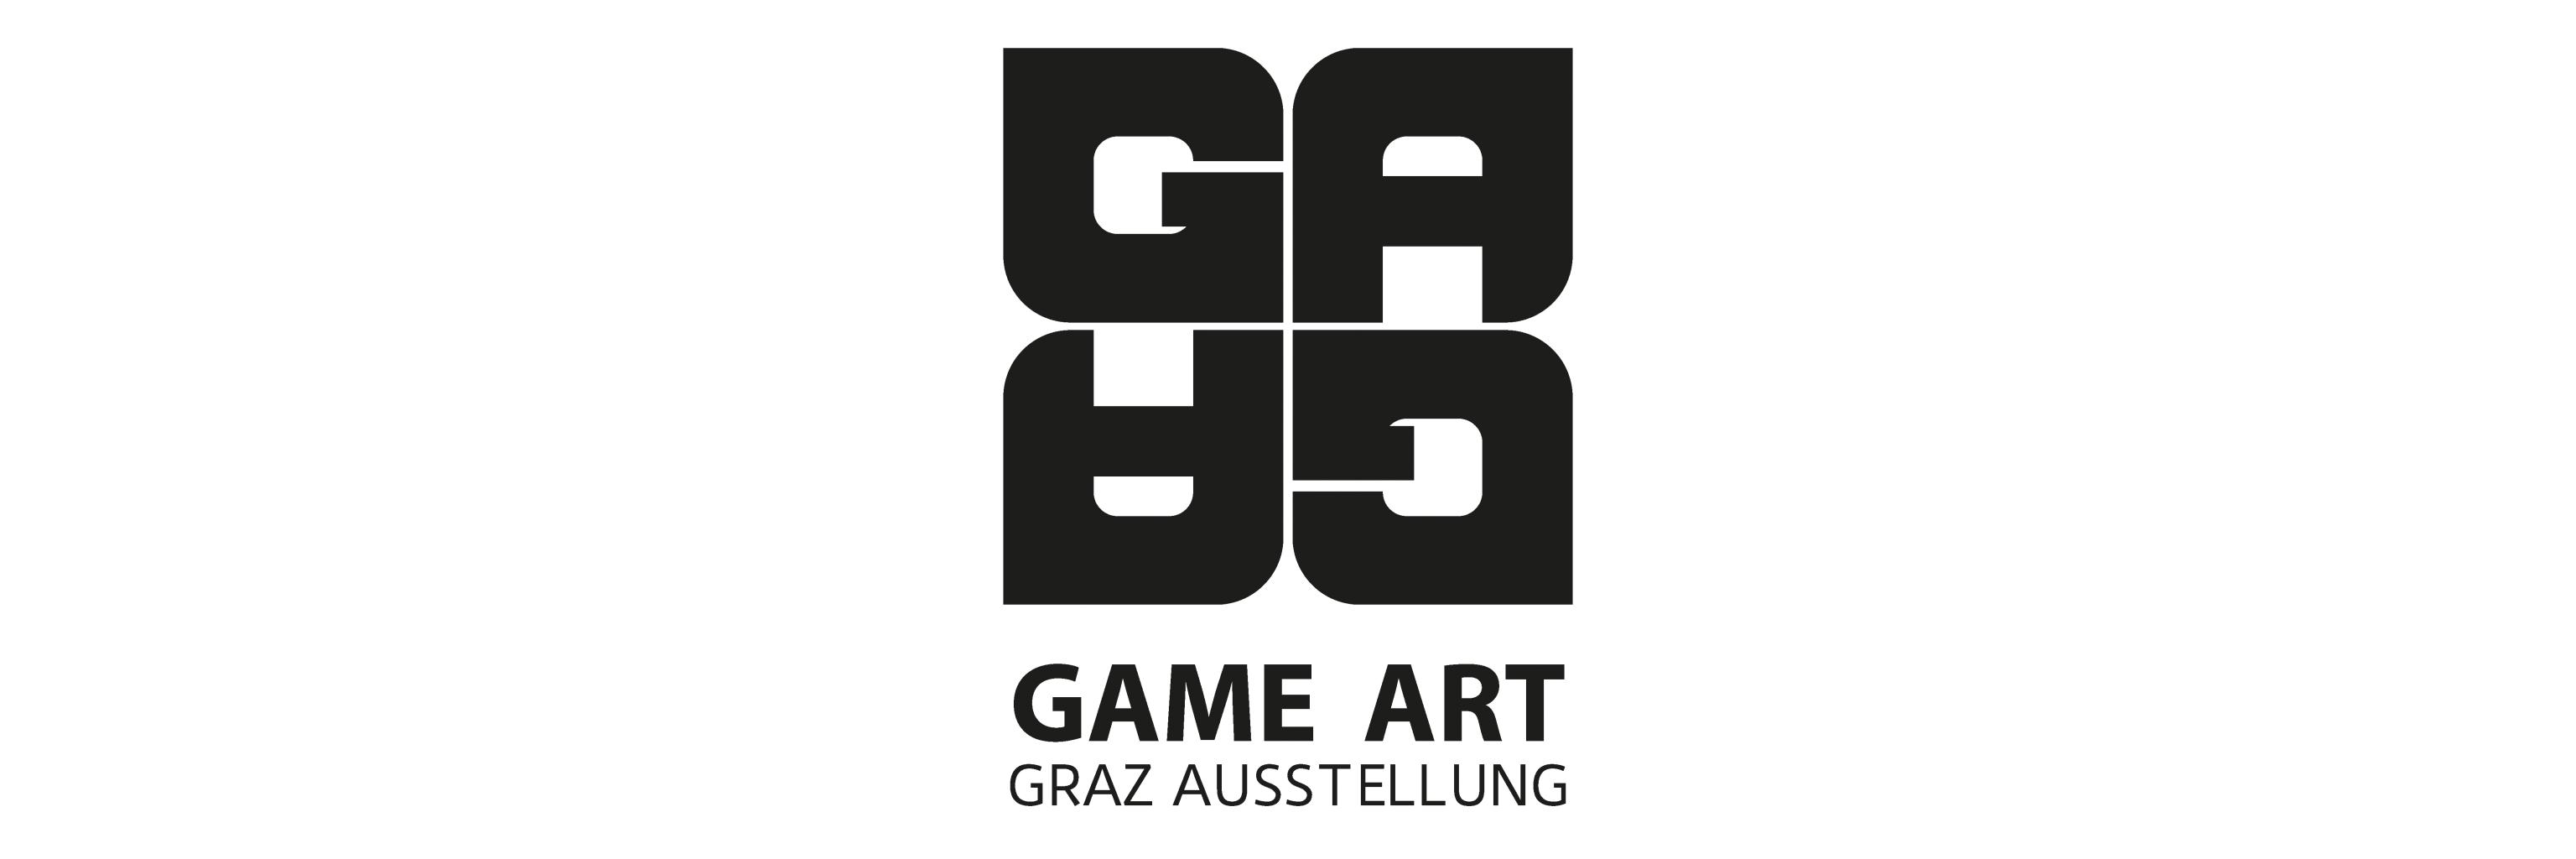 GAGA_logo_header